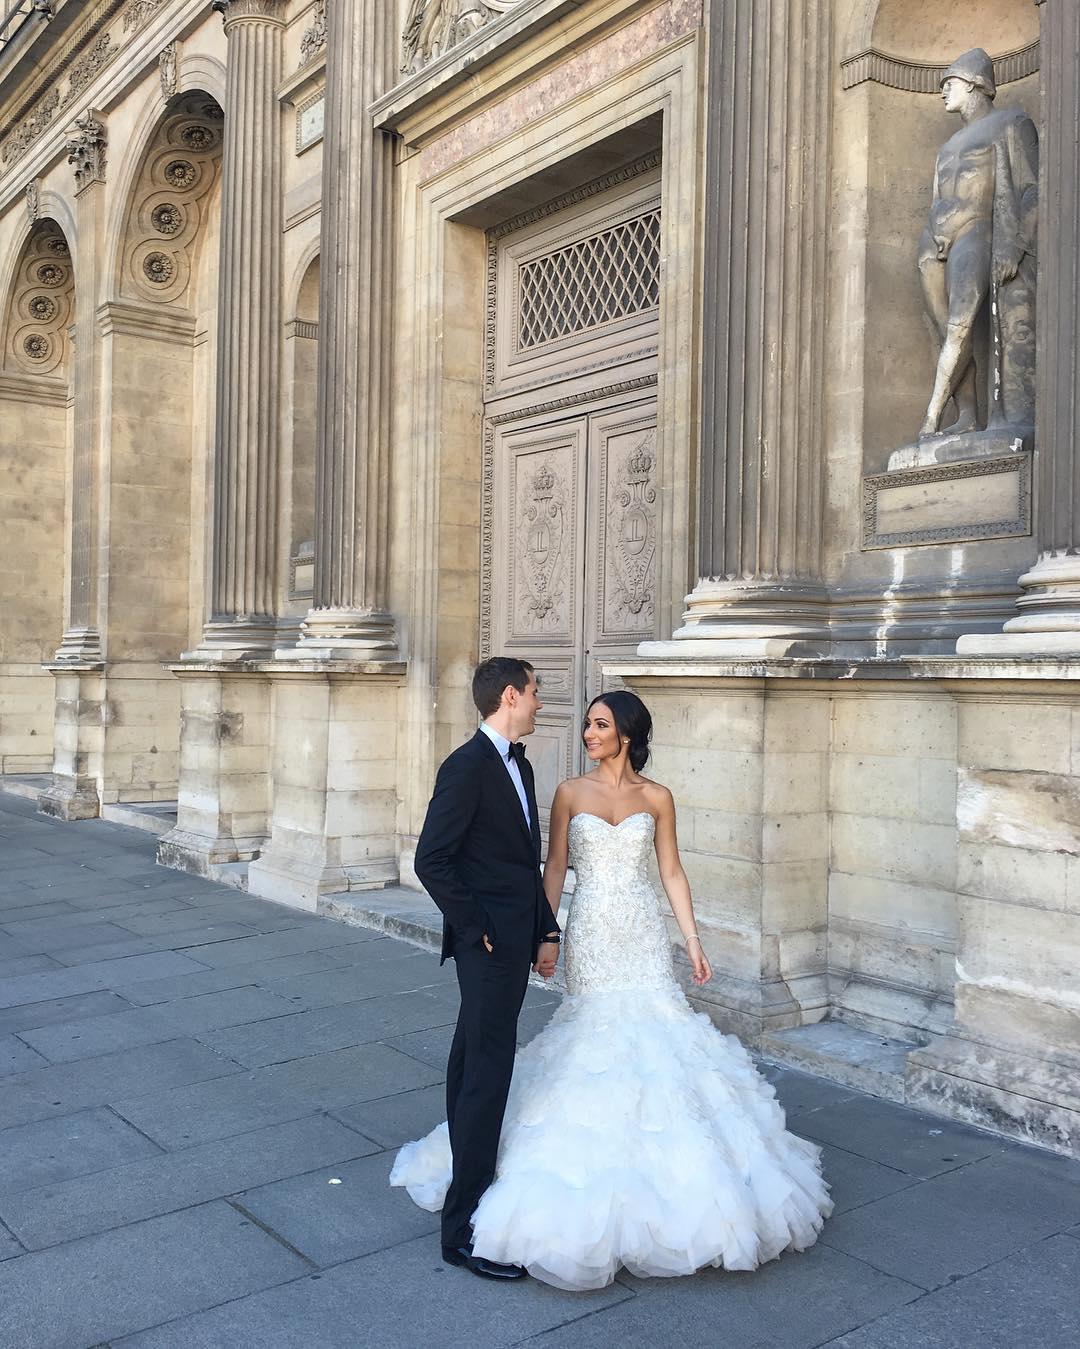 FtoKn92Yjgc - Фотографии последних летних свадеб (5 фото)